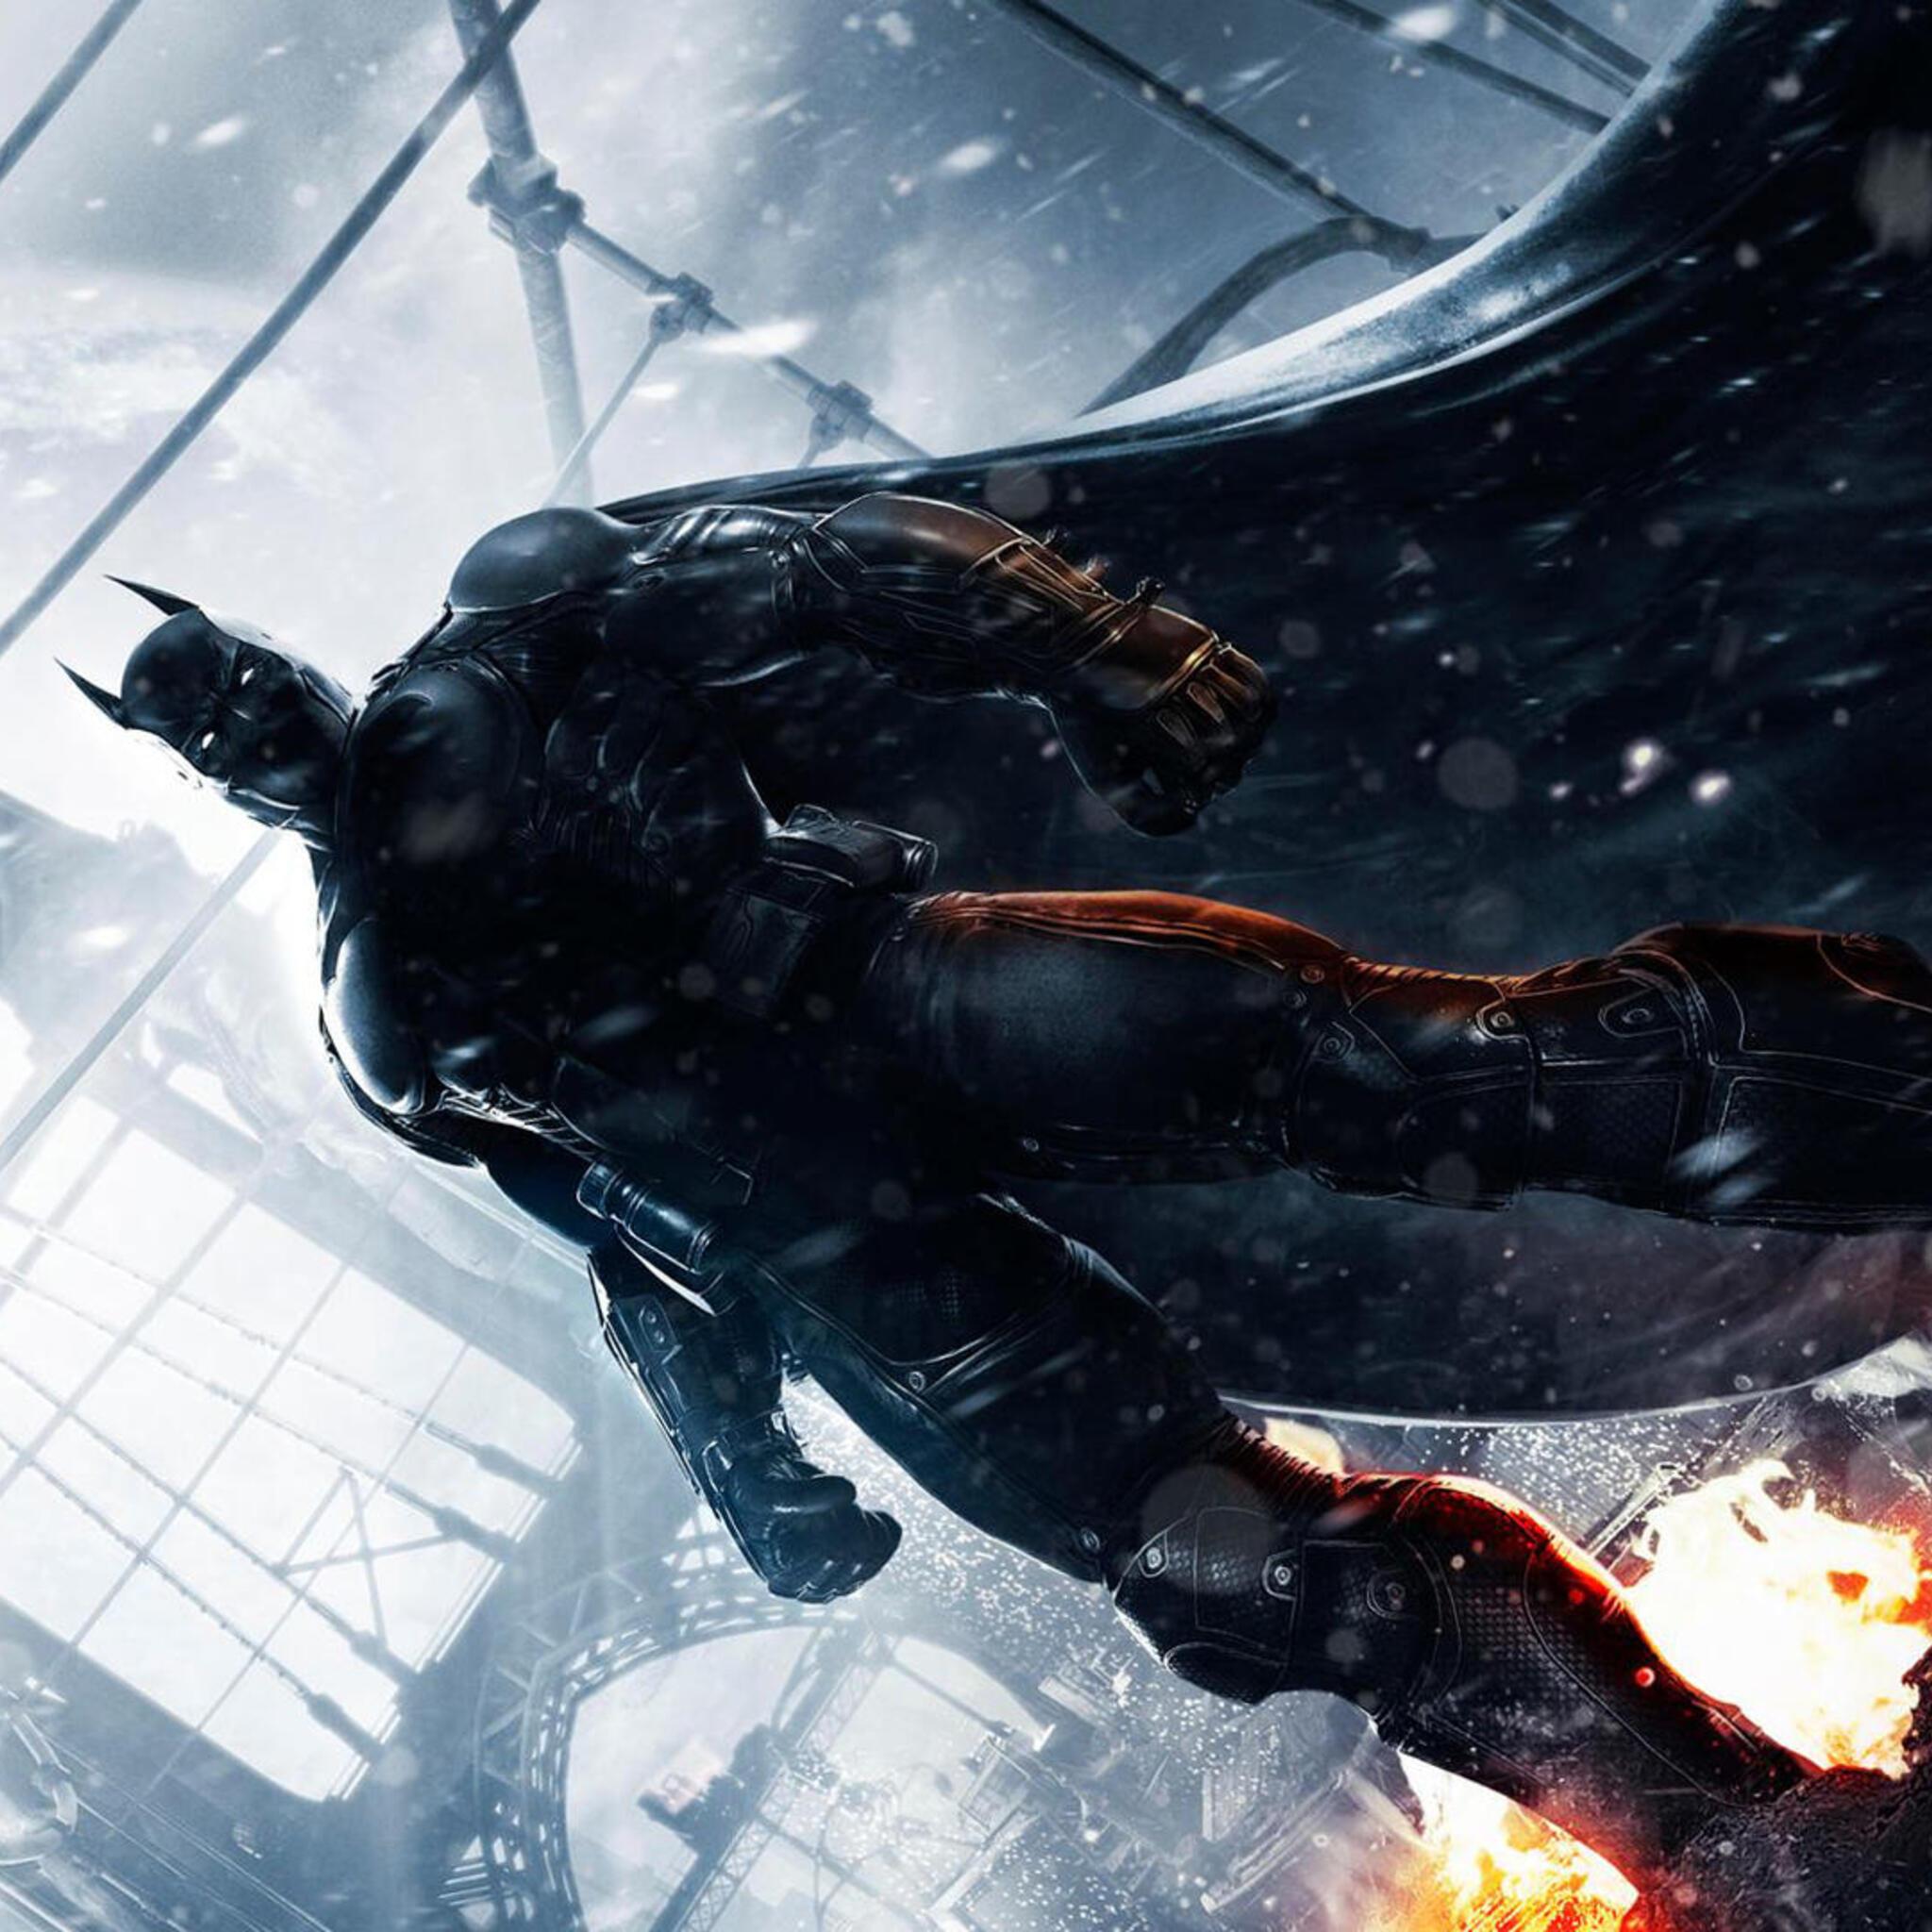 batman-arkham-origins-arts-rp.jpg